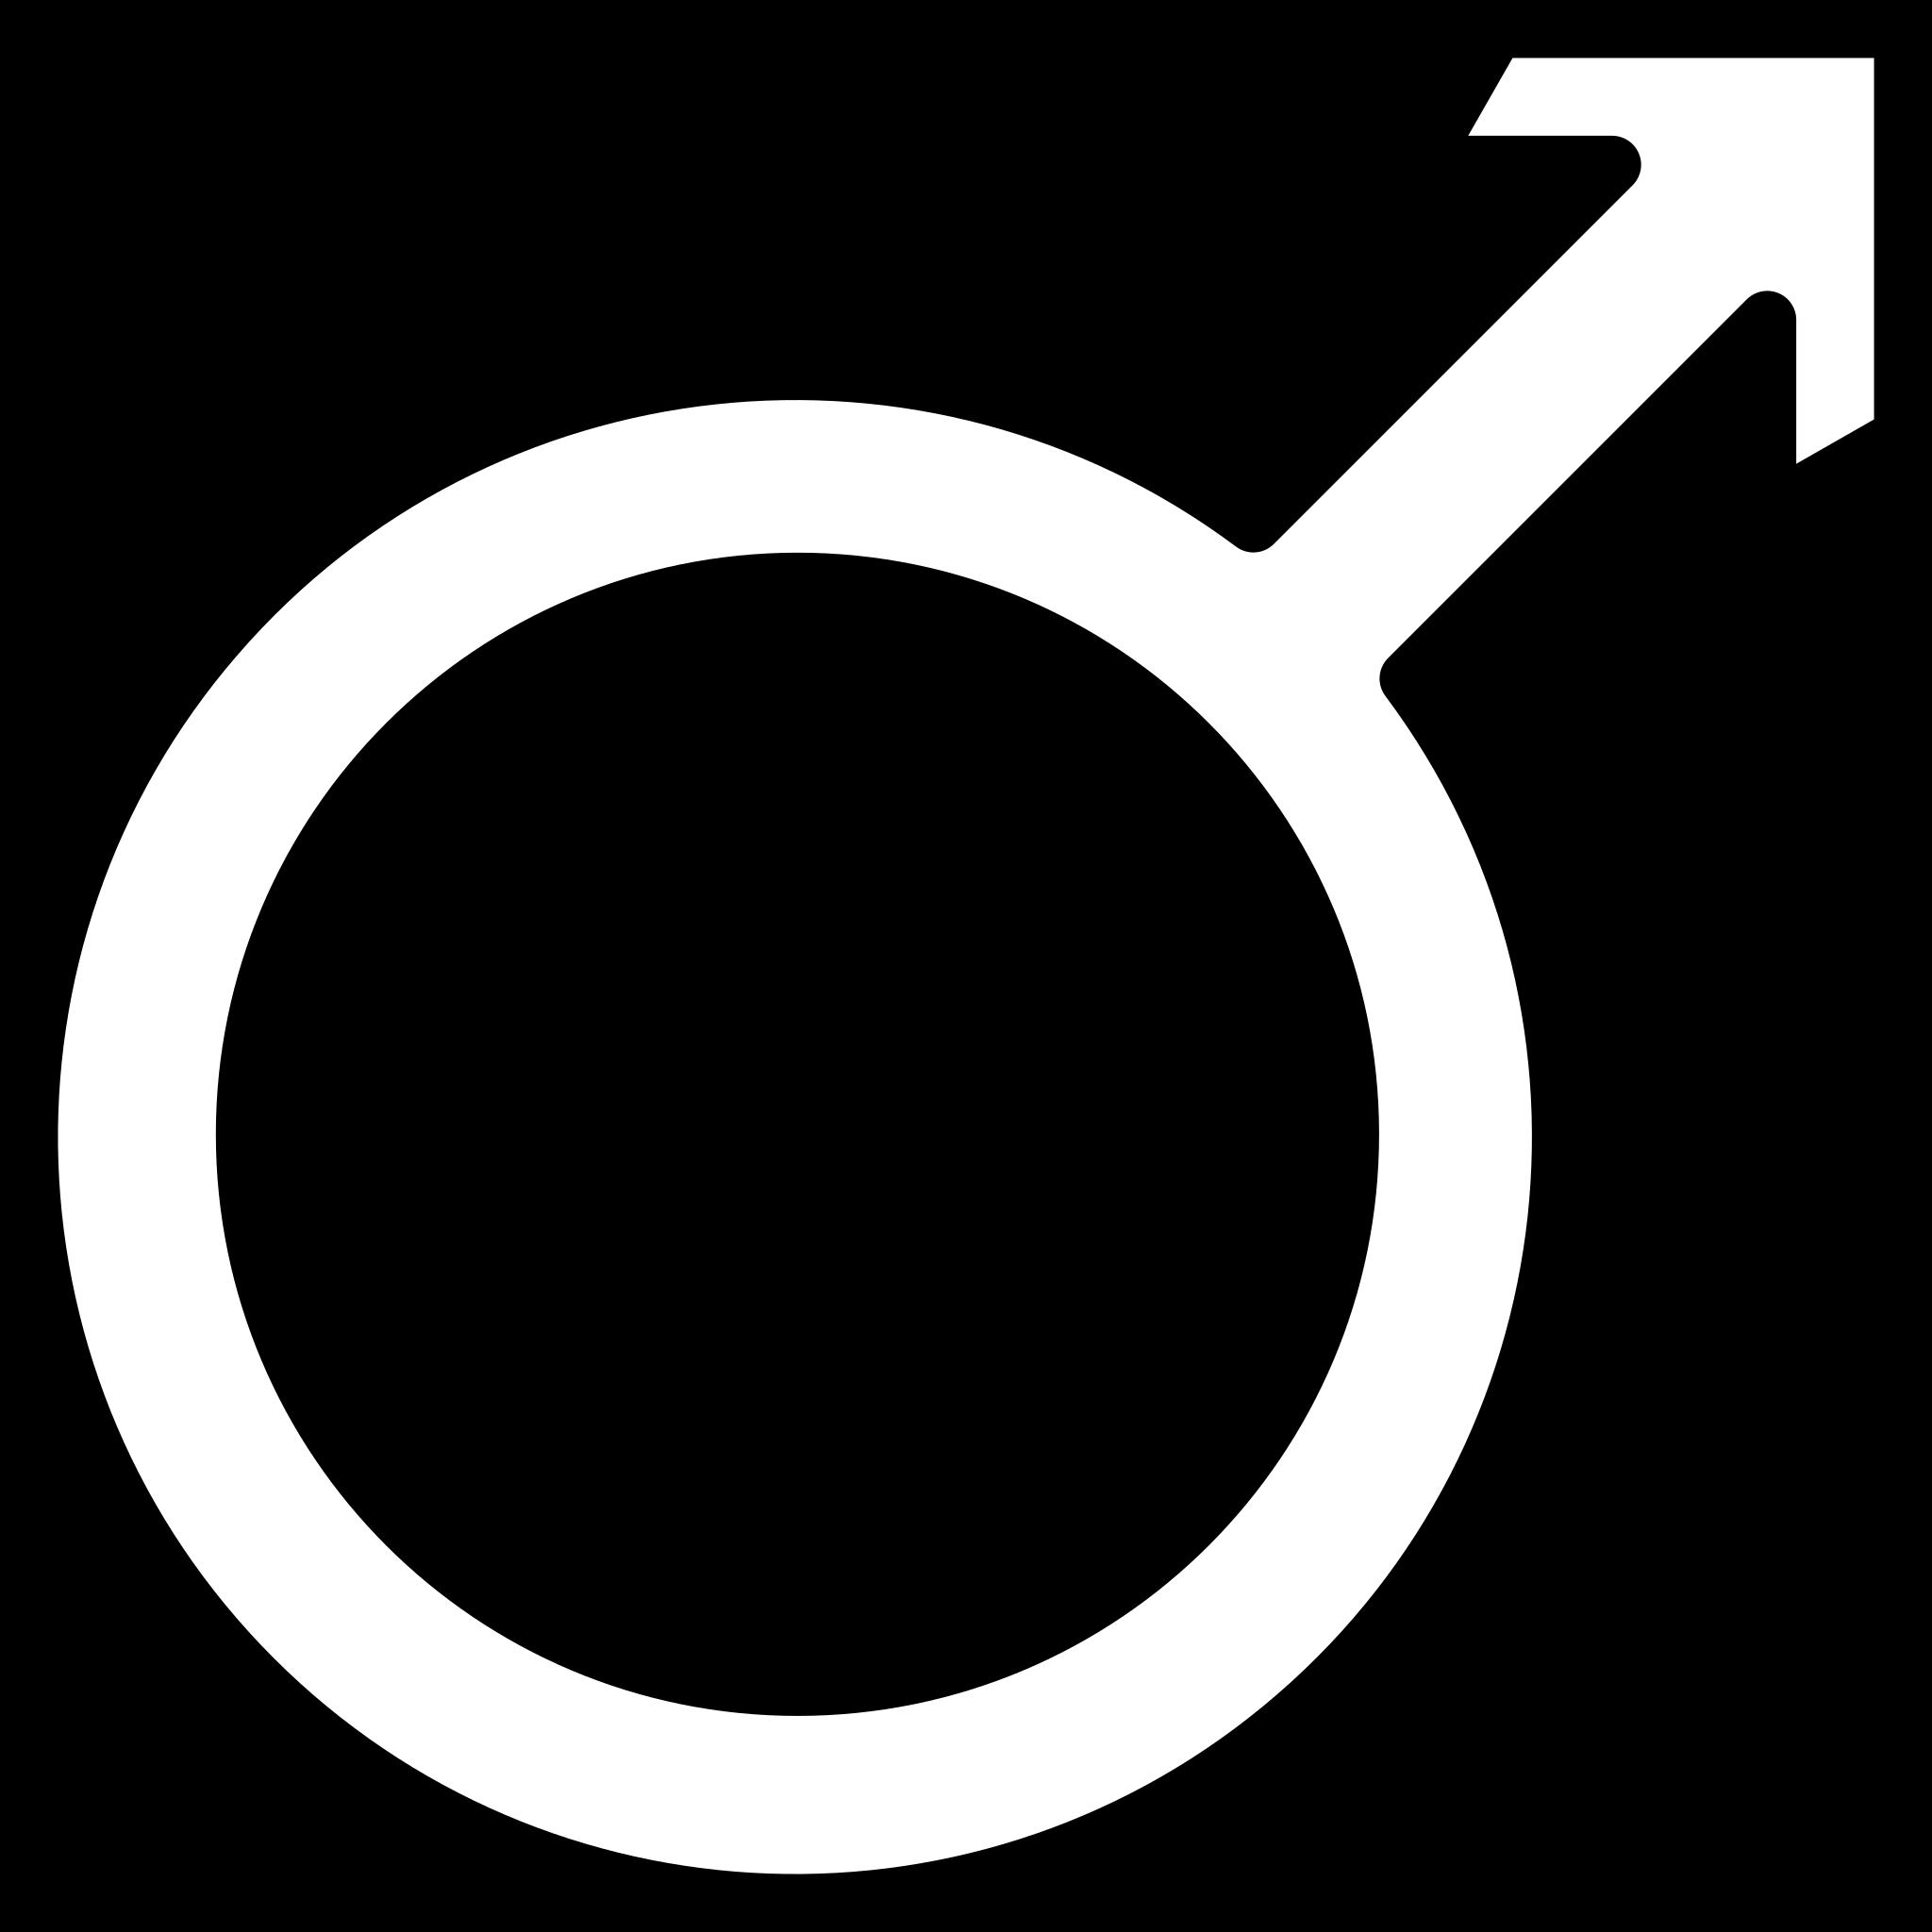 File:Male Symbol.png